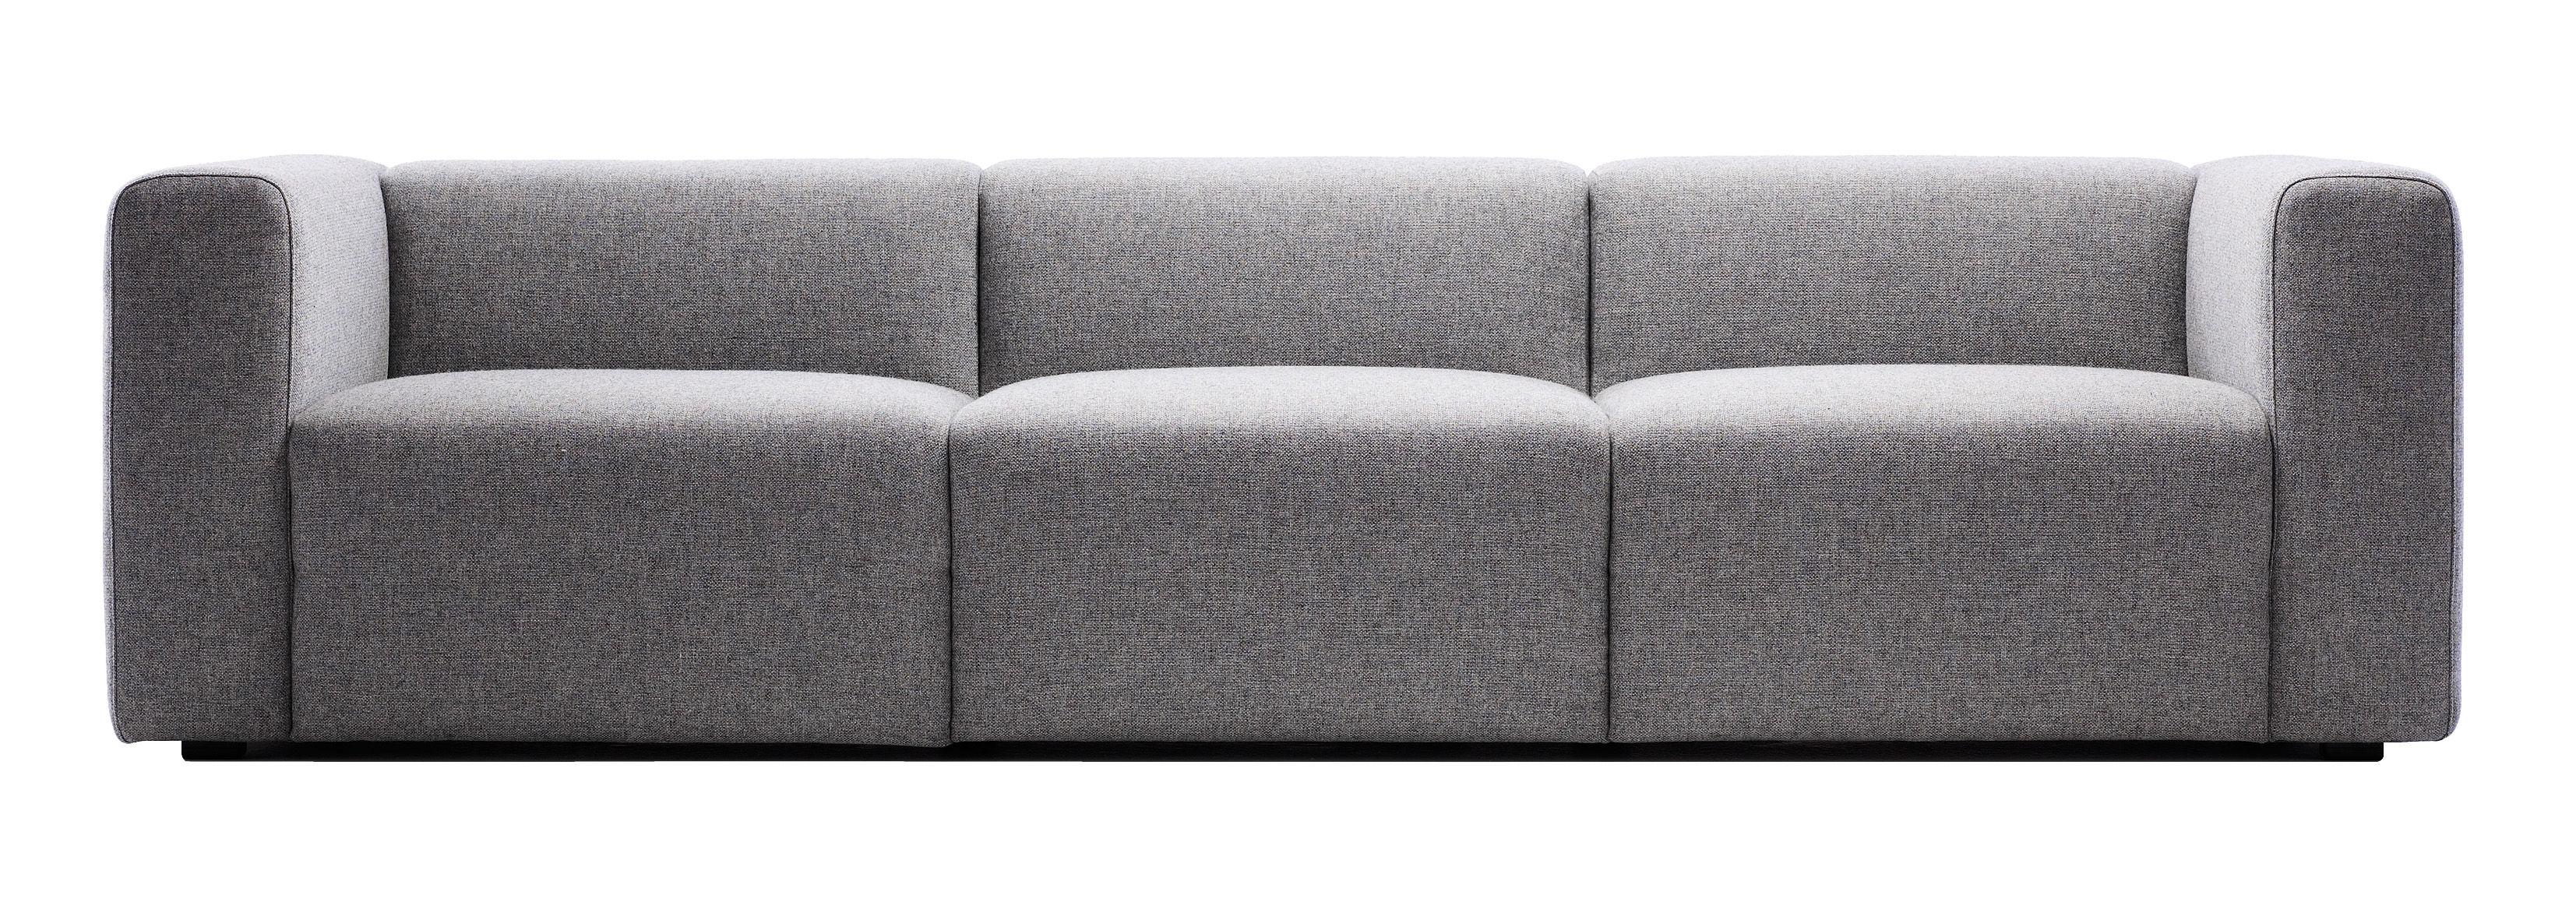 Möbel - Sofas - Mags Sofa 3-Sitzer - L 266 cm - Hay - Hellgrau - Steelcut TrioStoff - Kvadrat-Gewebe